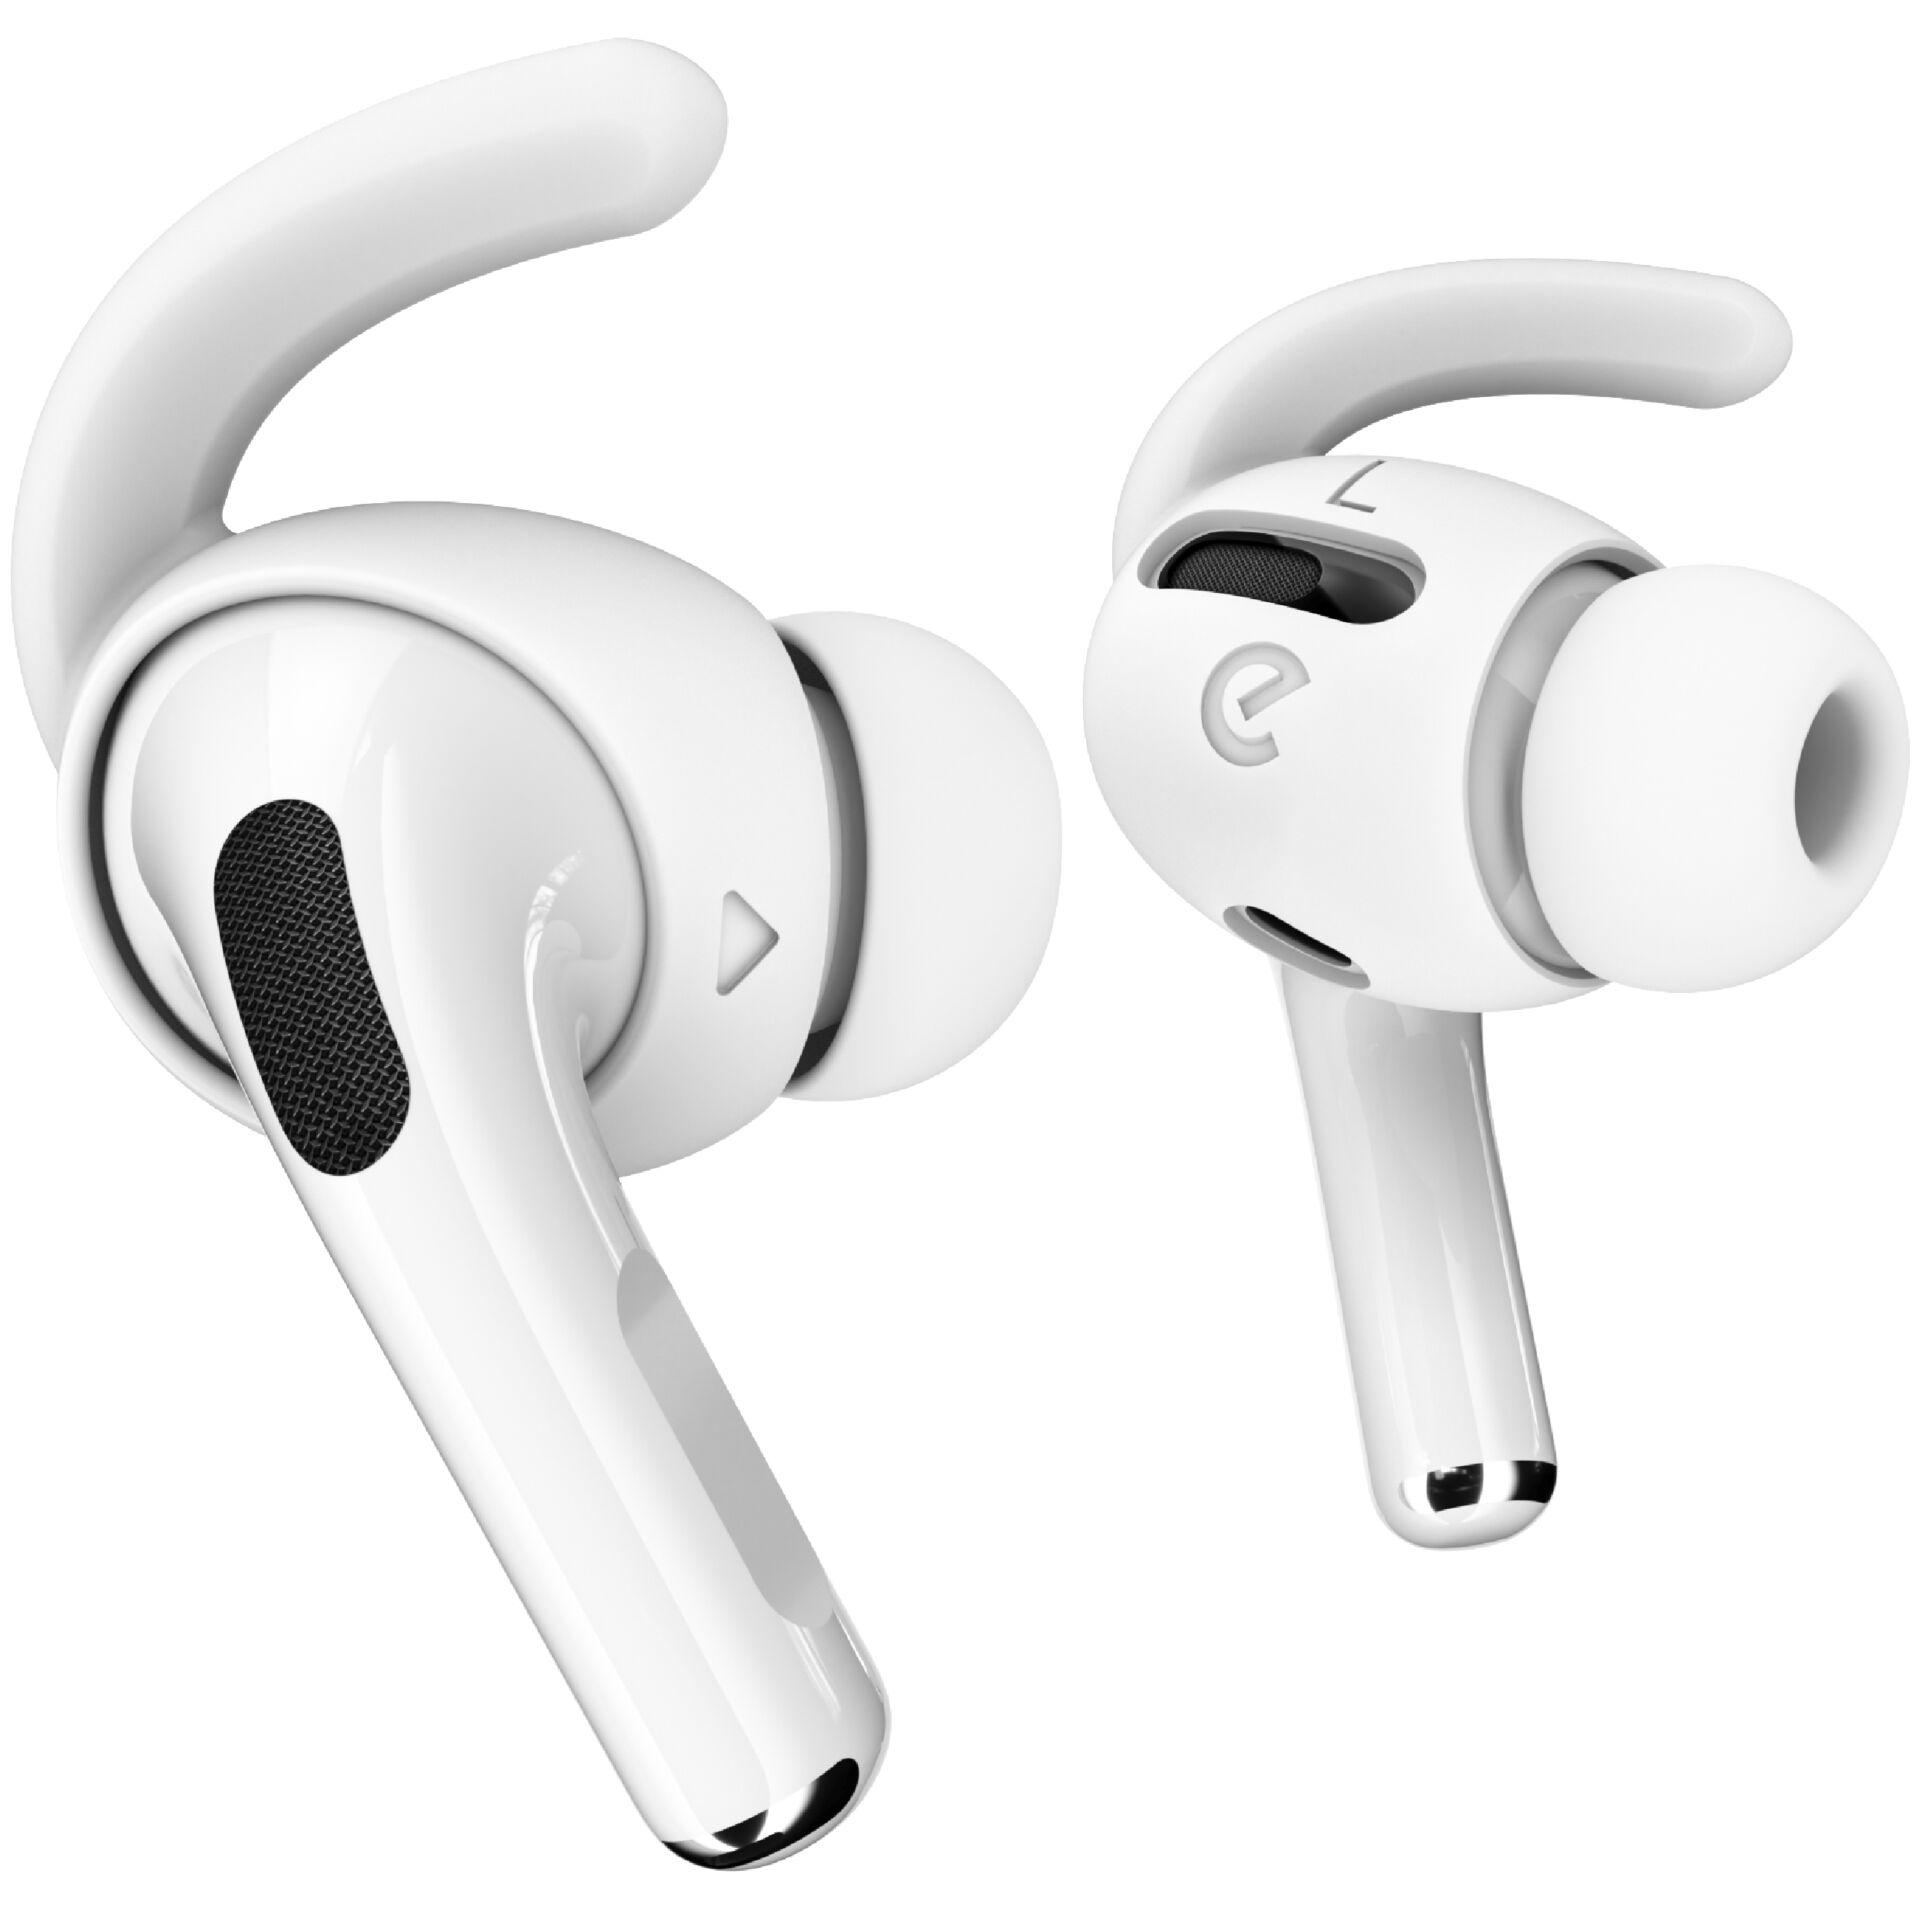 KeyBudz EarBuddyz for AirPods Pro White